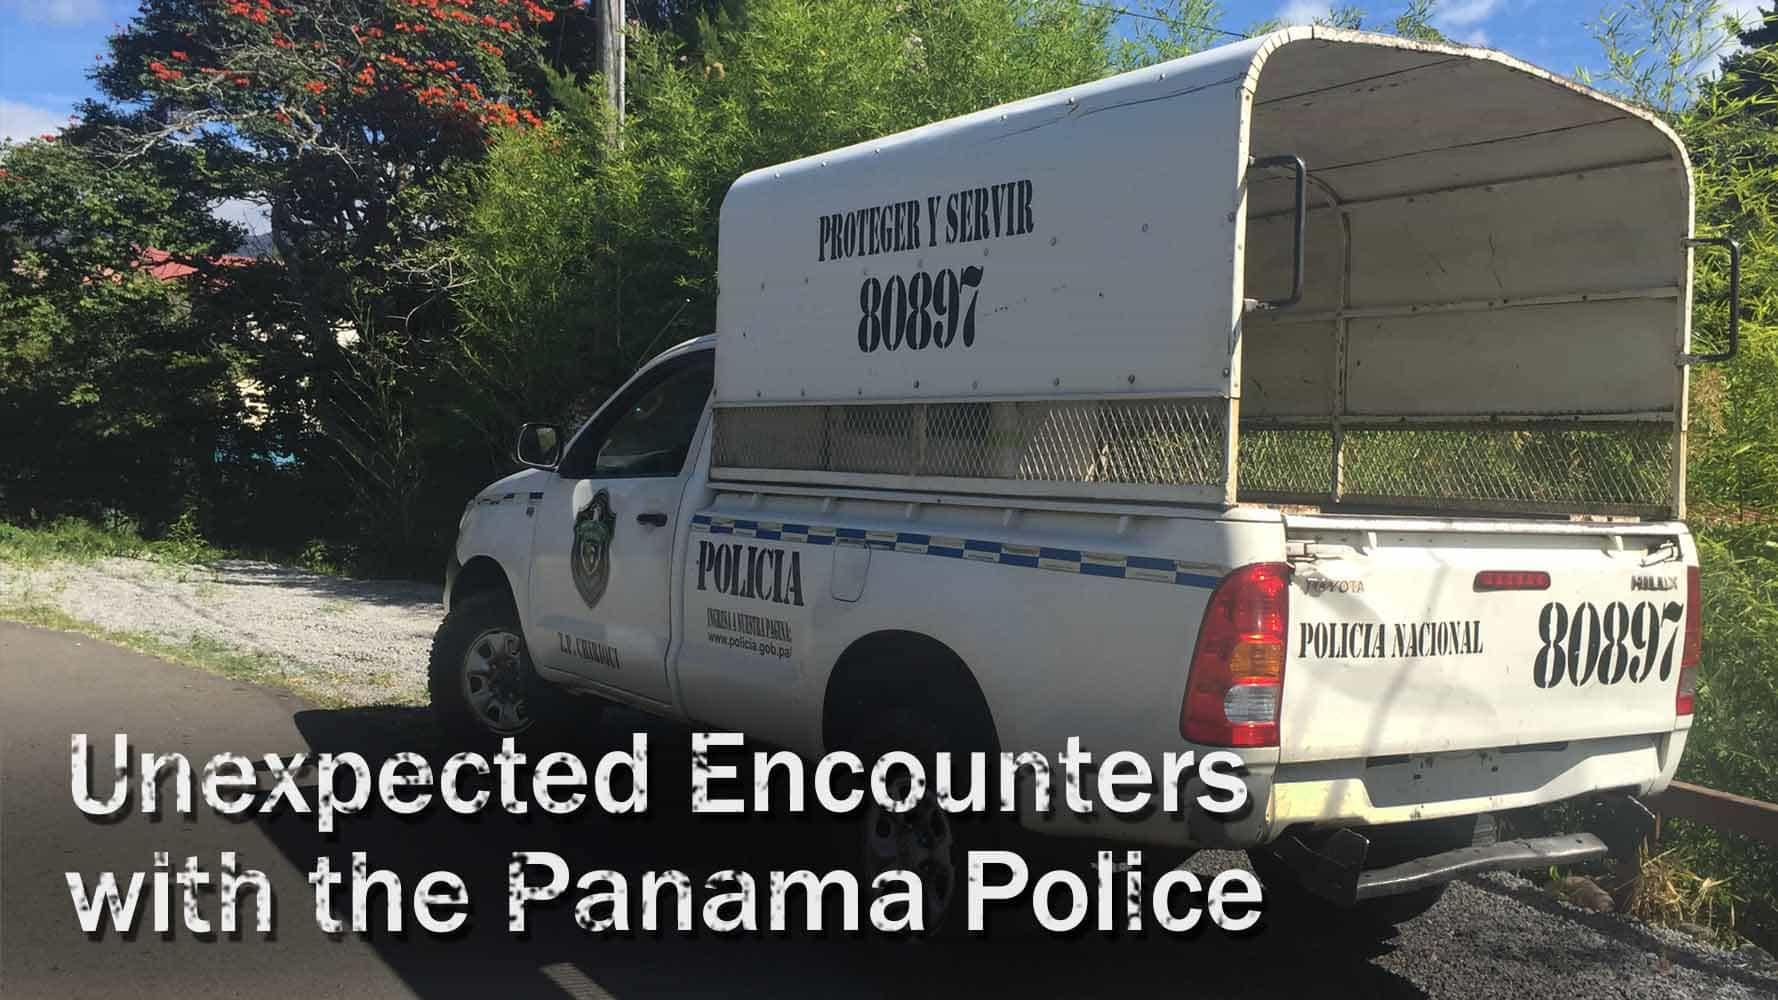 Panama Police